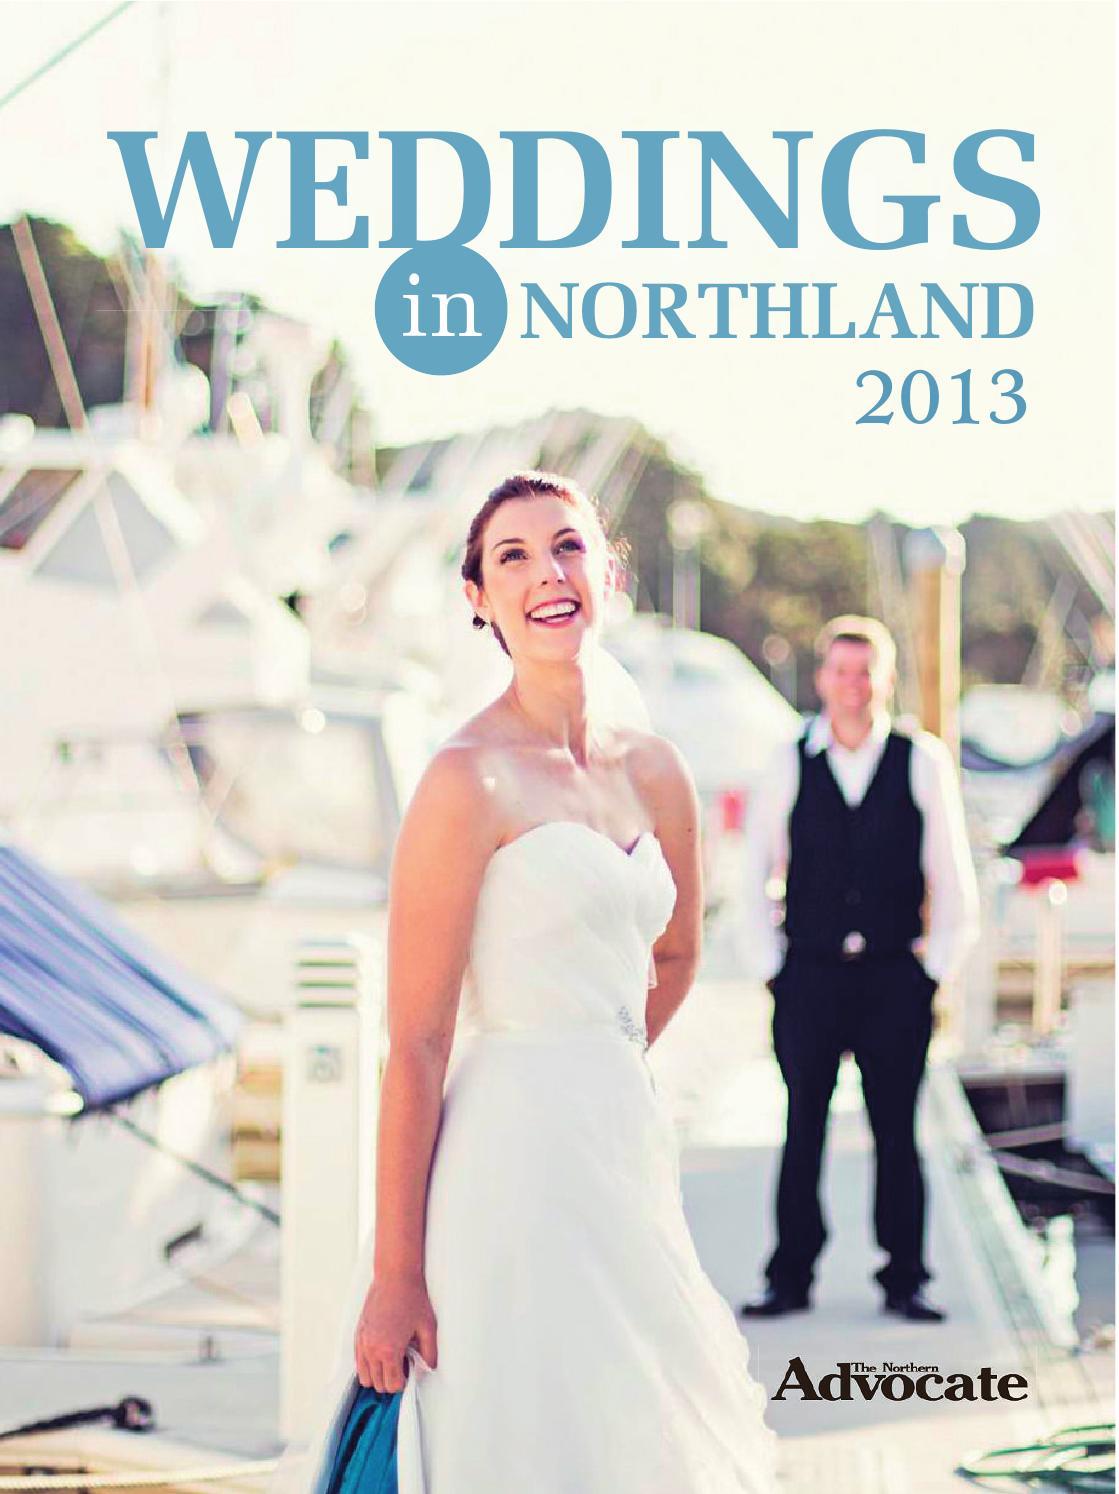 Weddings ebook by Northern Advocate - issuu